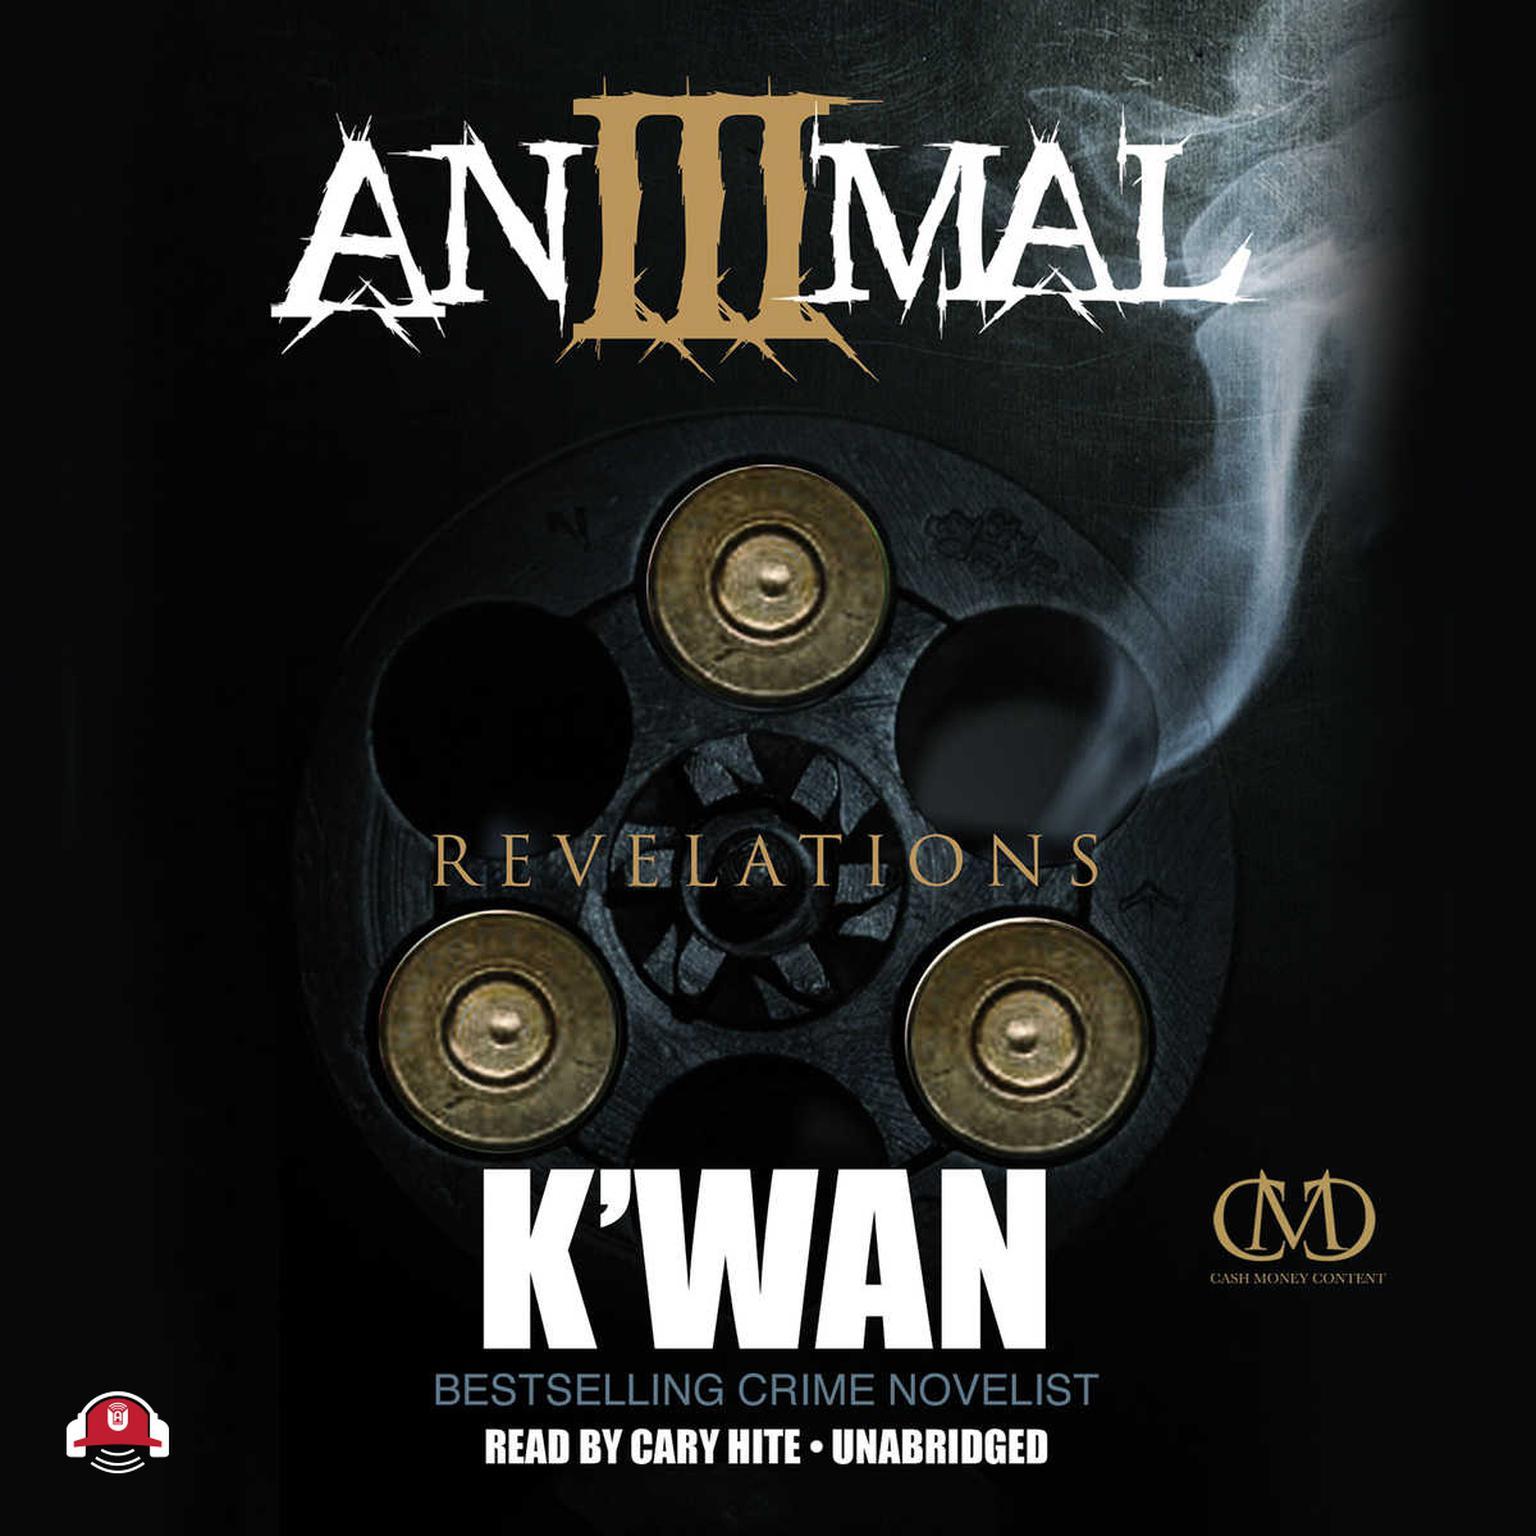 Printable Animal 3: Revelations Audiobook Cover Art